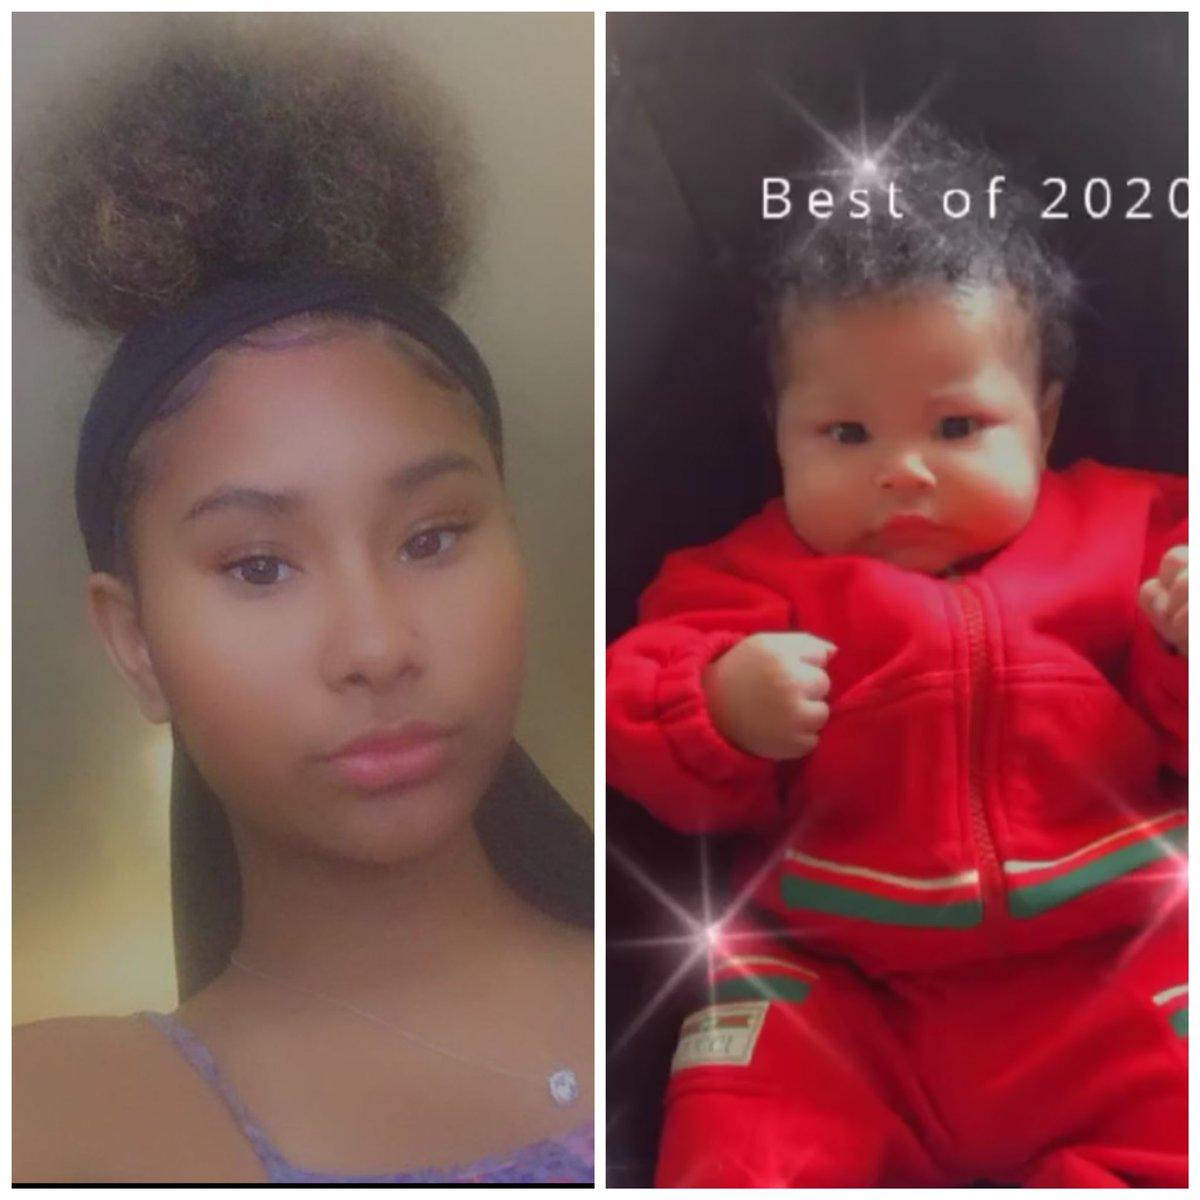 @NICKIMINAJ Auntie Ming has a twin 😍